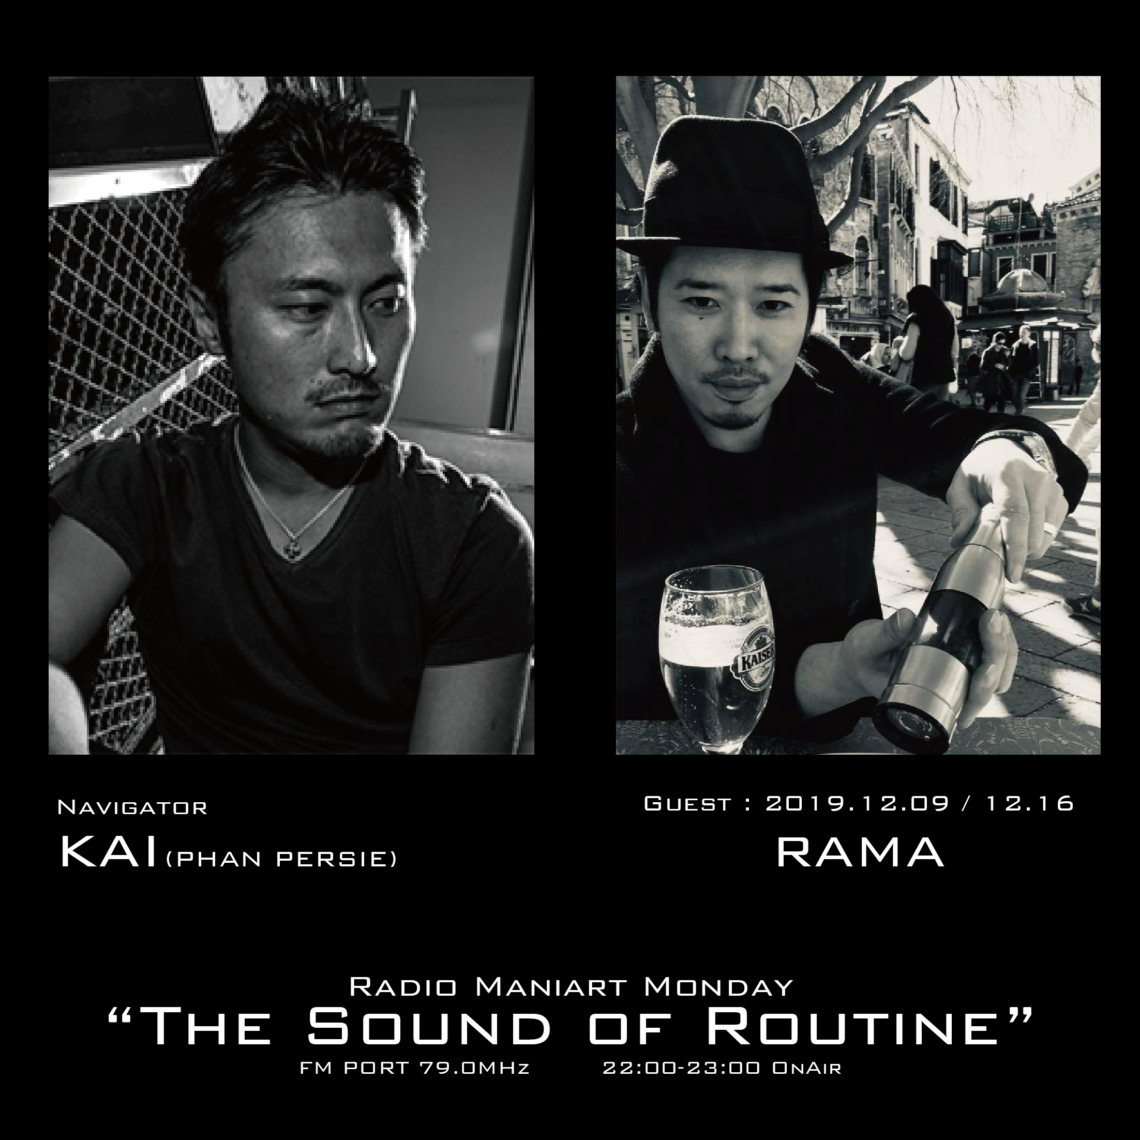 2019. 12. 9 MON, 12. 16 MON – KAI : Navigator on FM PORT / the Sound of Routine – Guest : RAMA